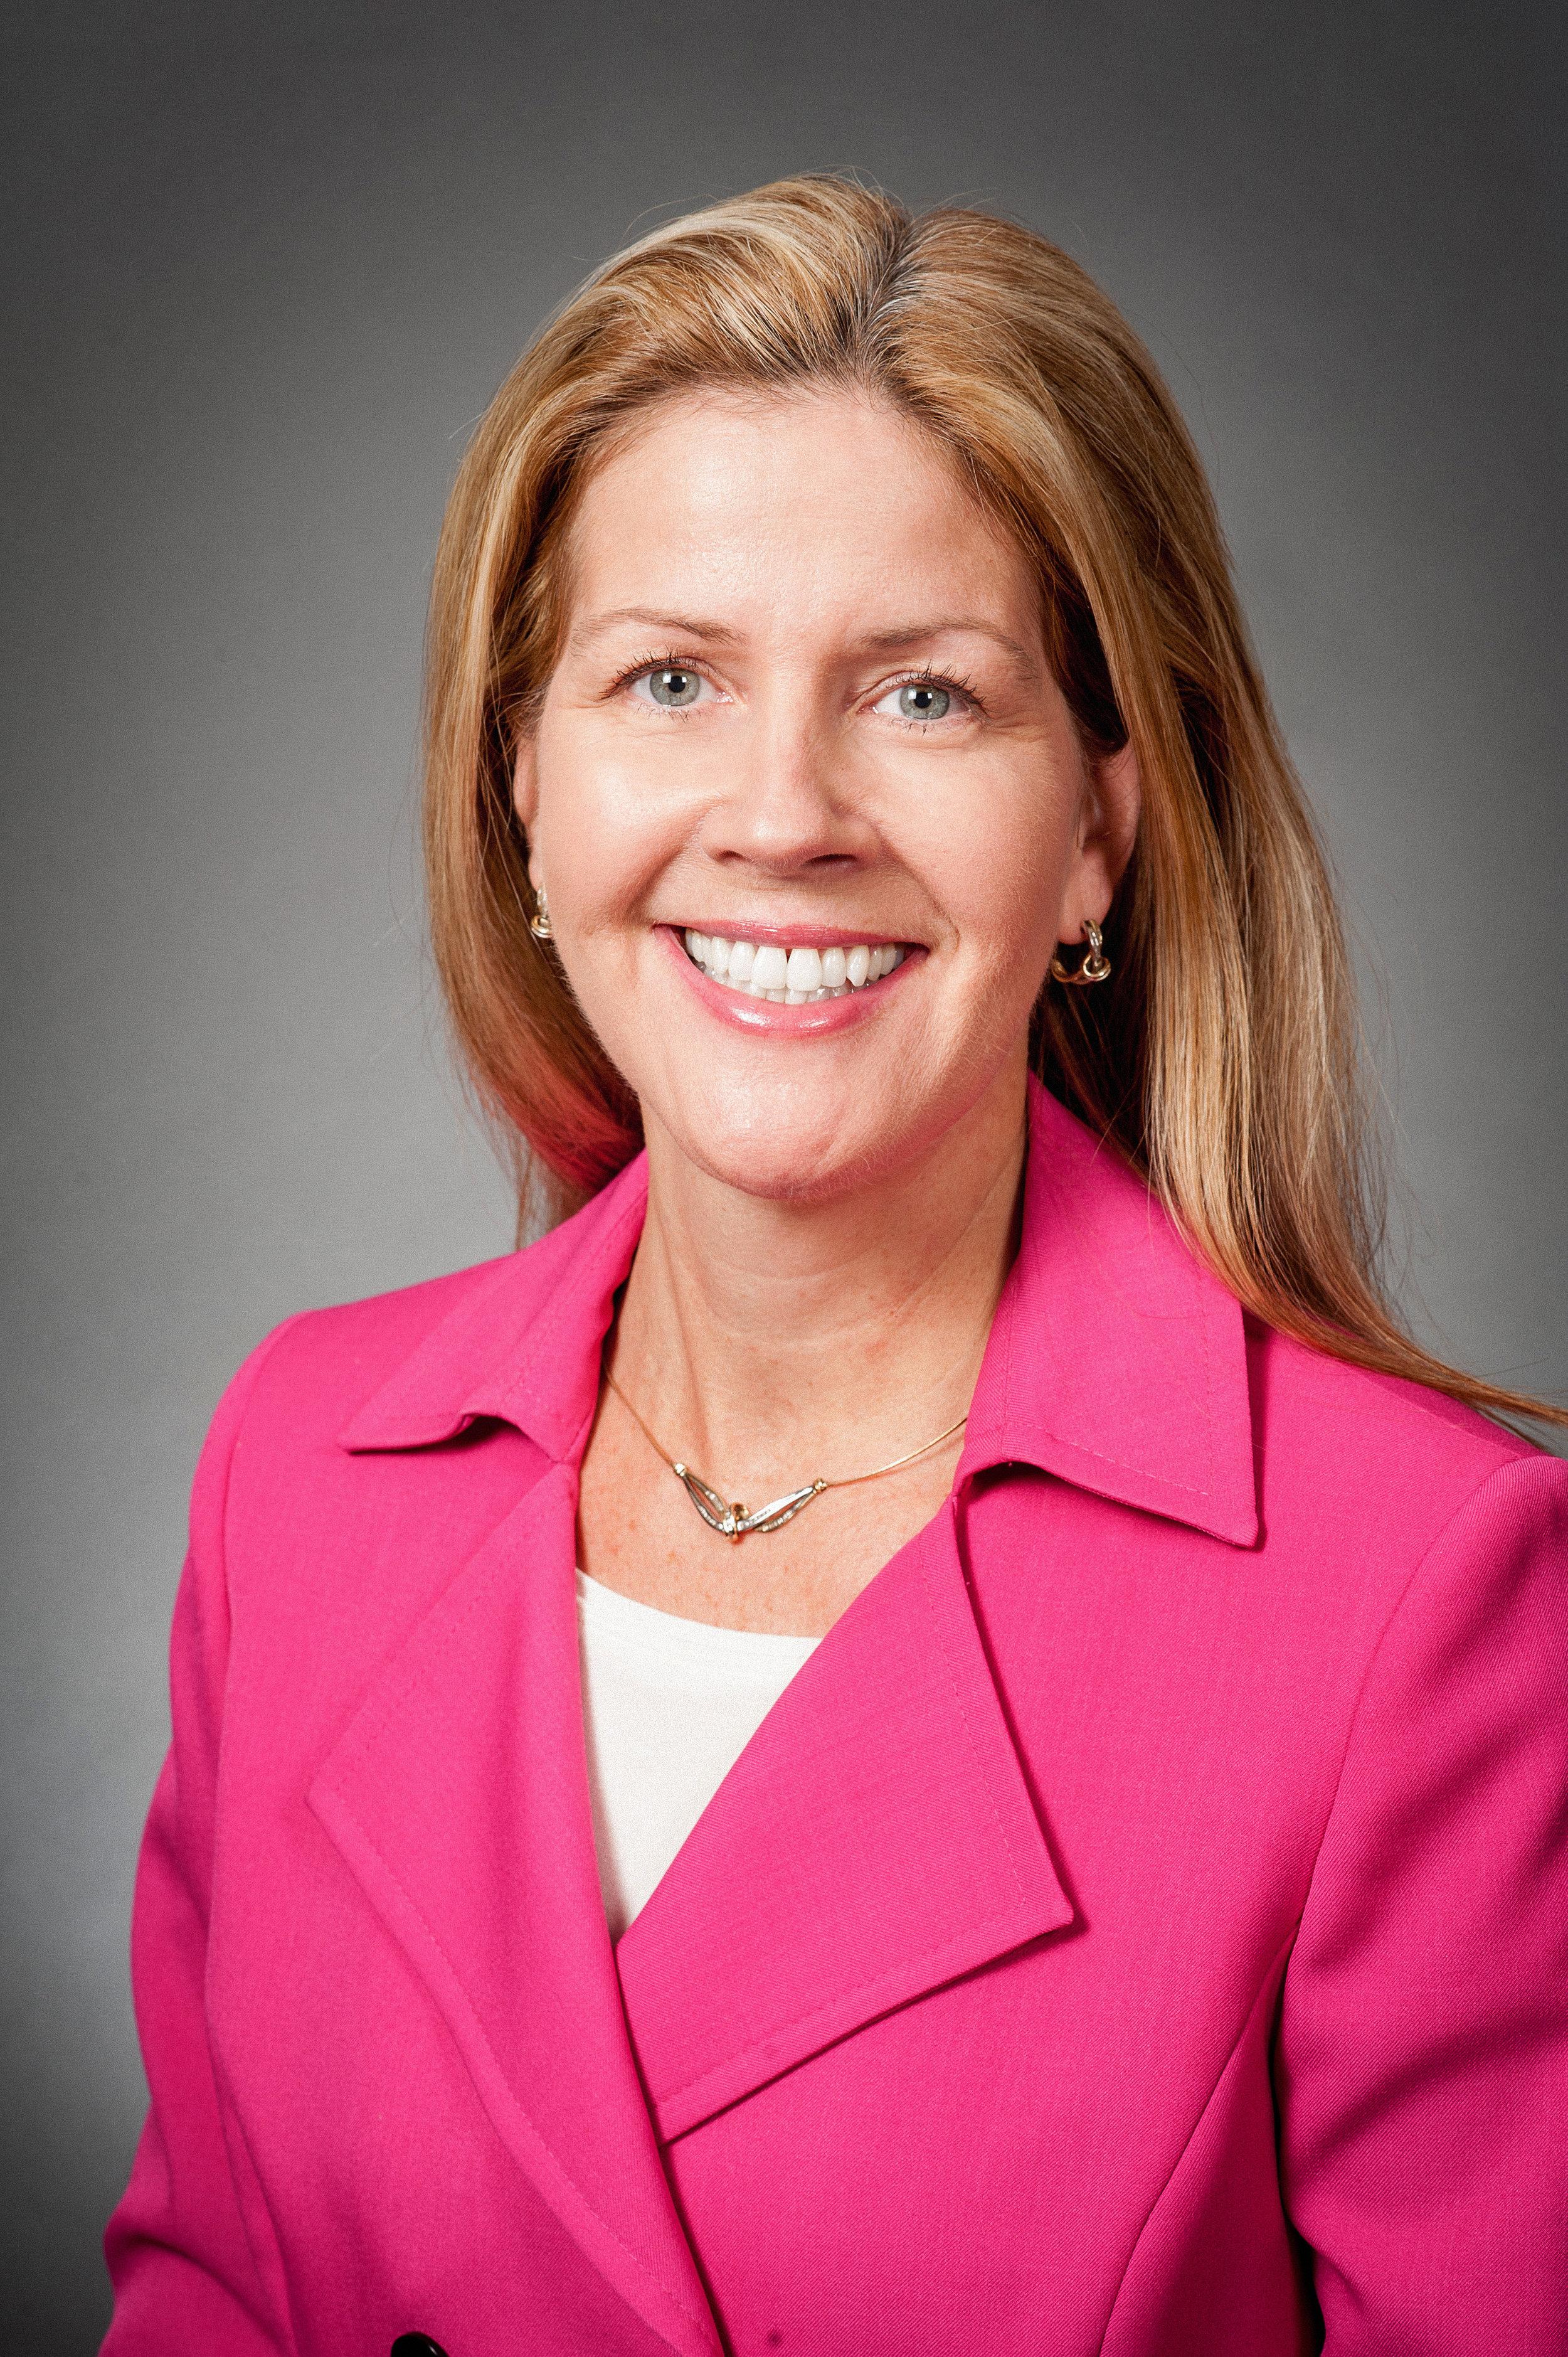 Abbey Redden, CPA - Tax Partner